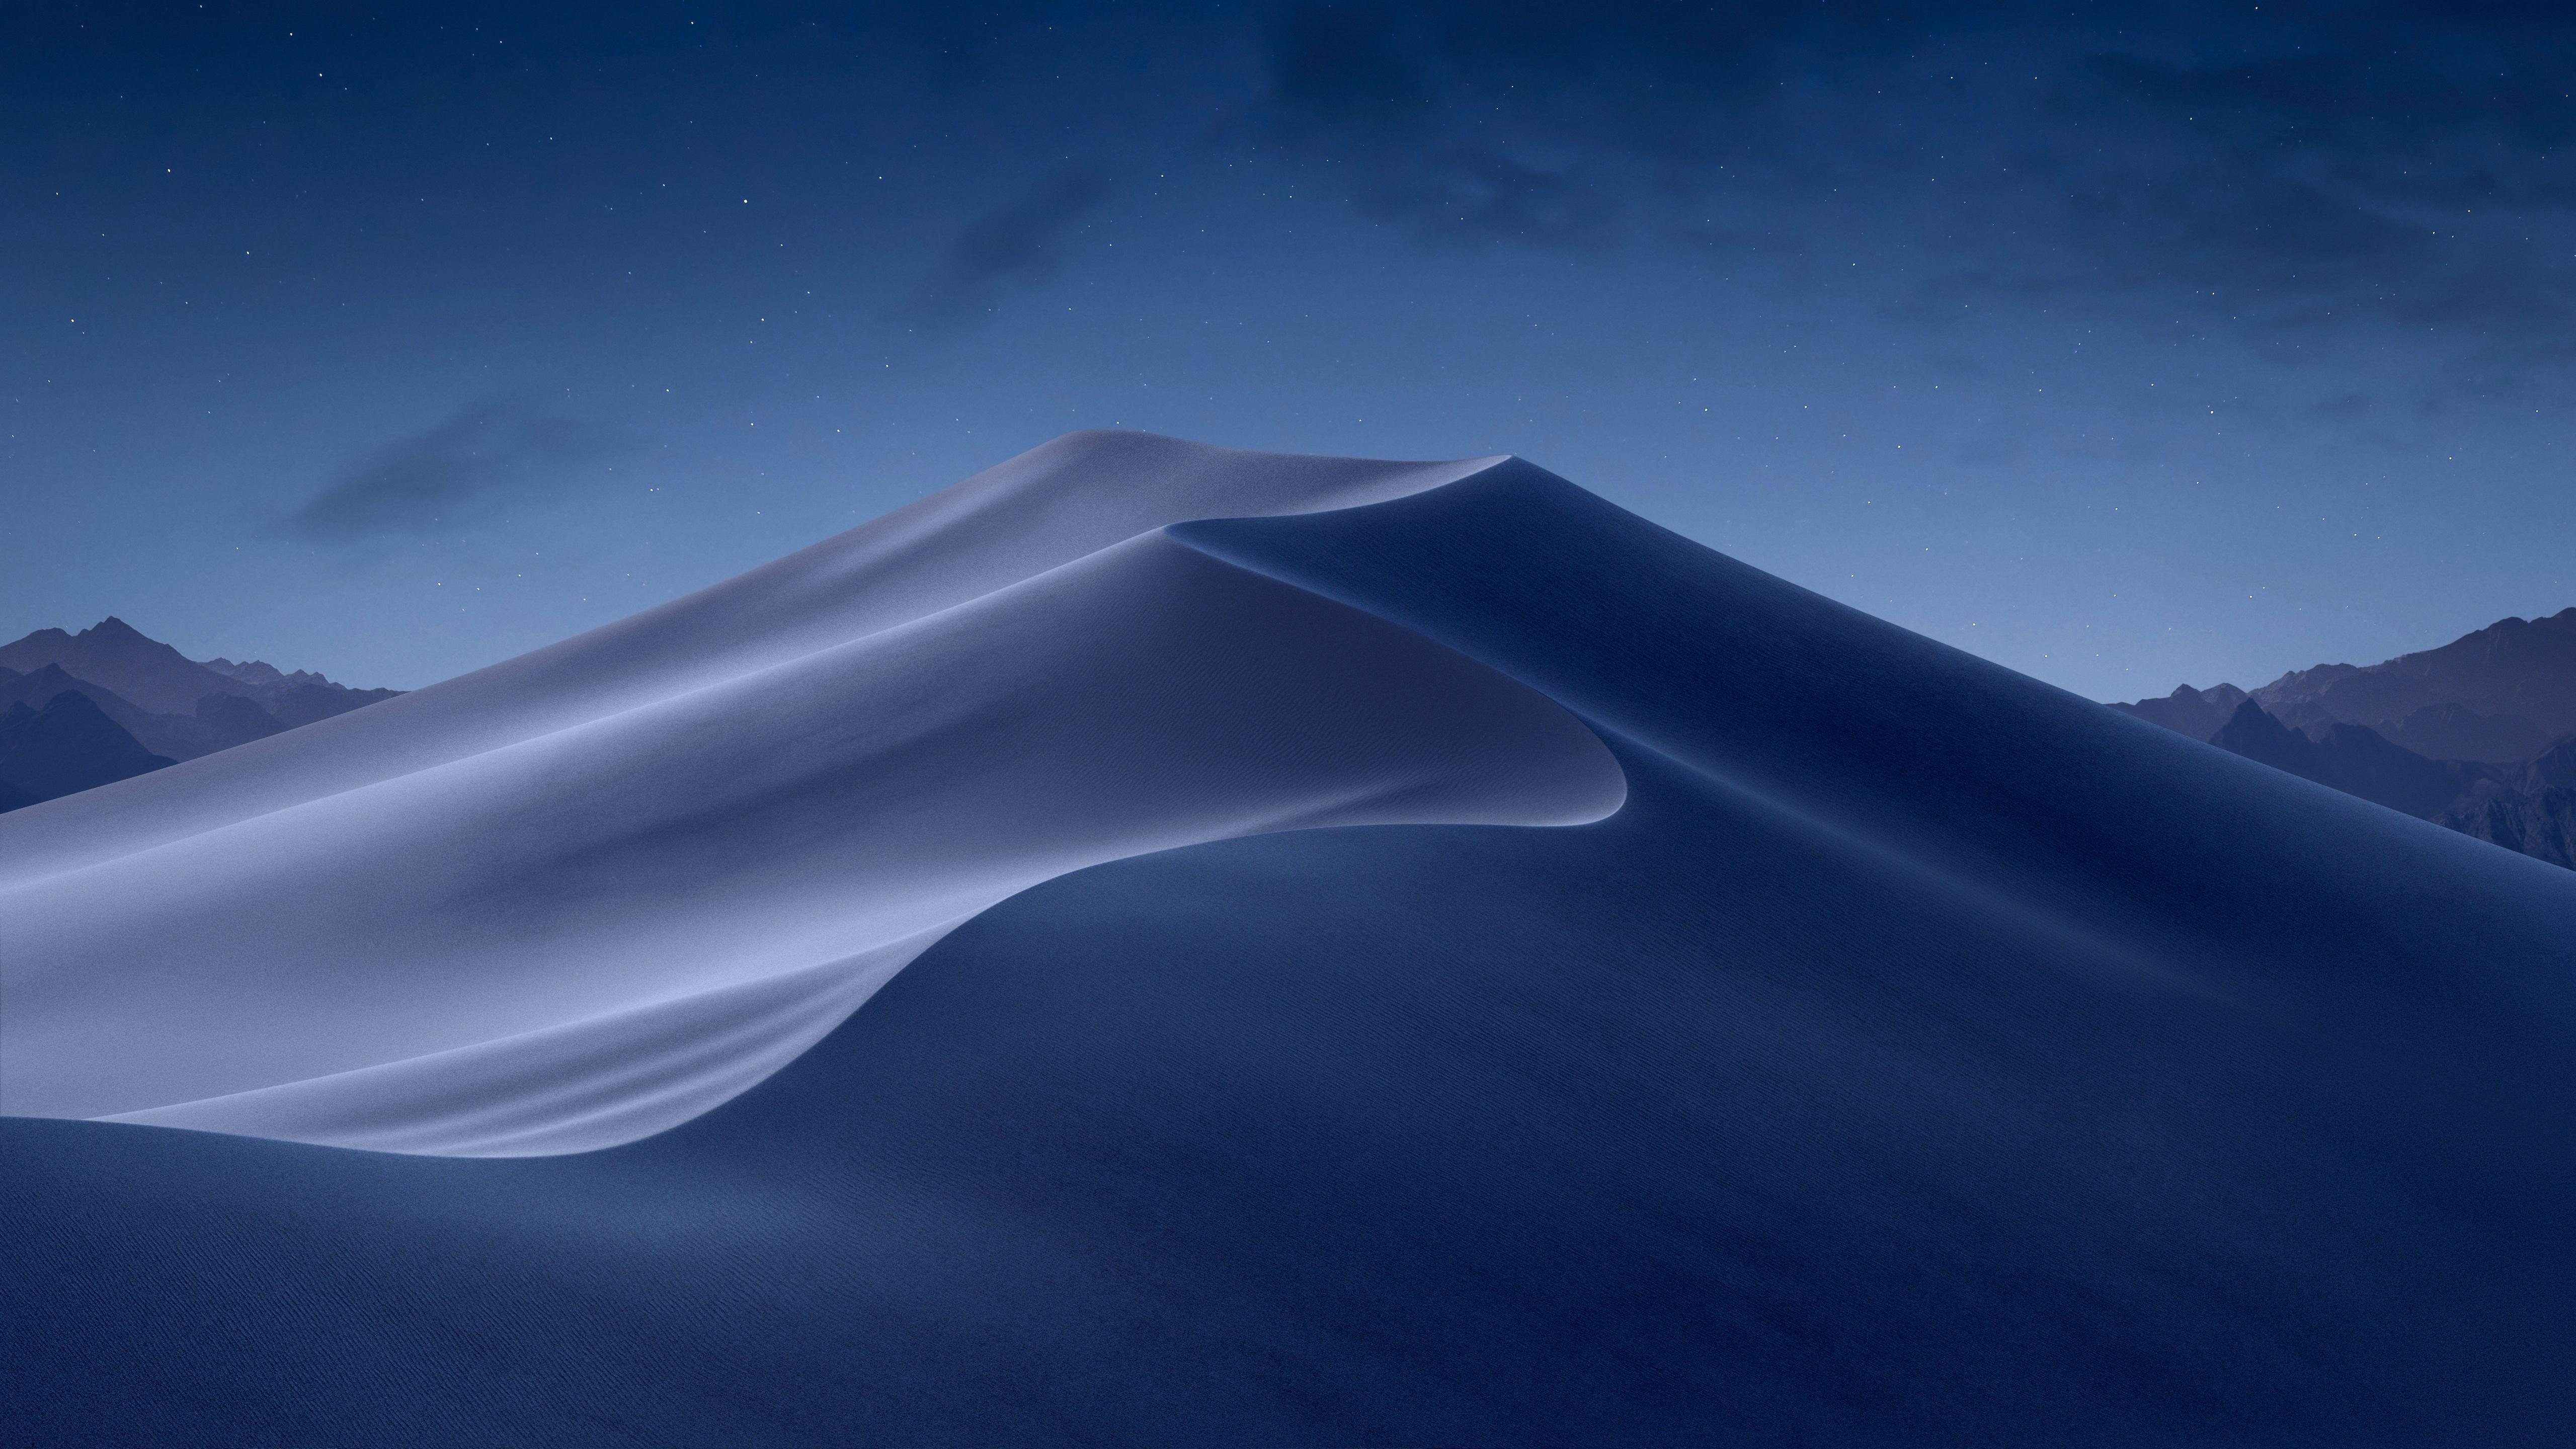 desktop wallpaper,blue,sky,natural environment,atmosphere,azure